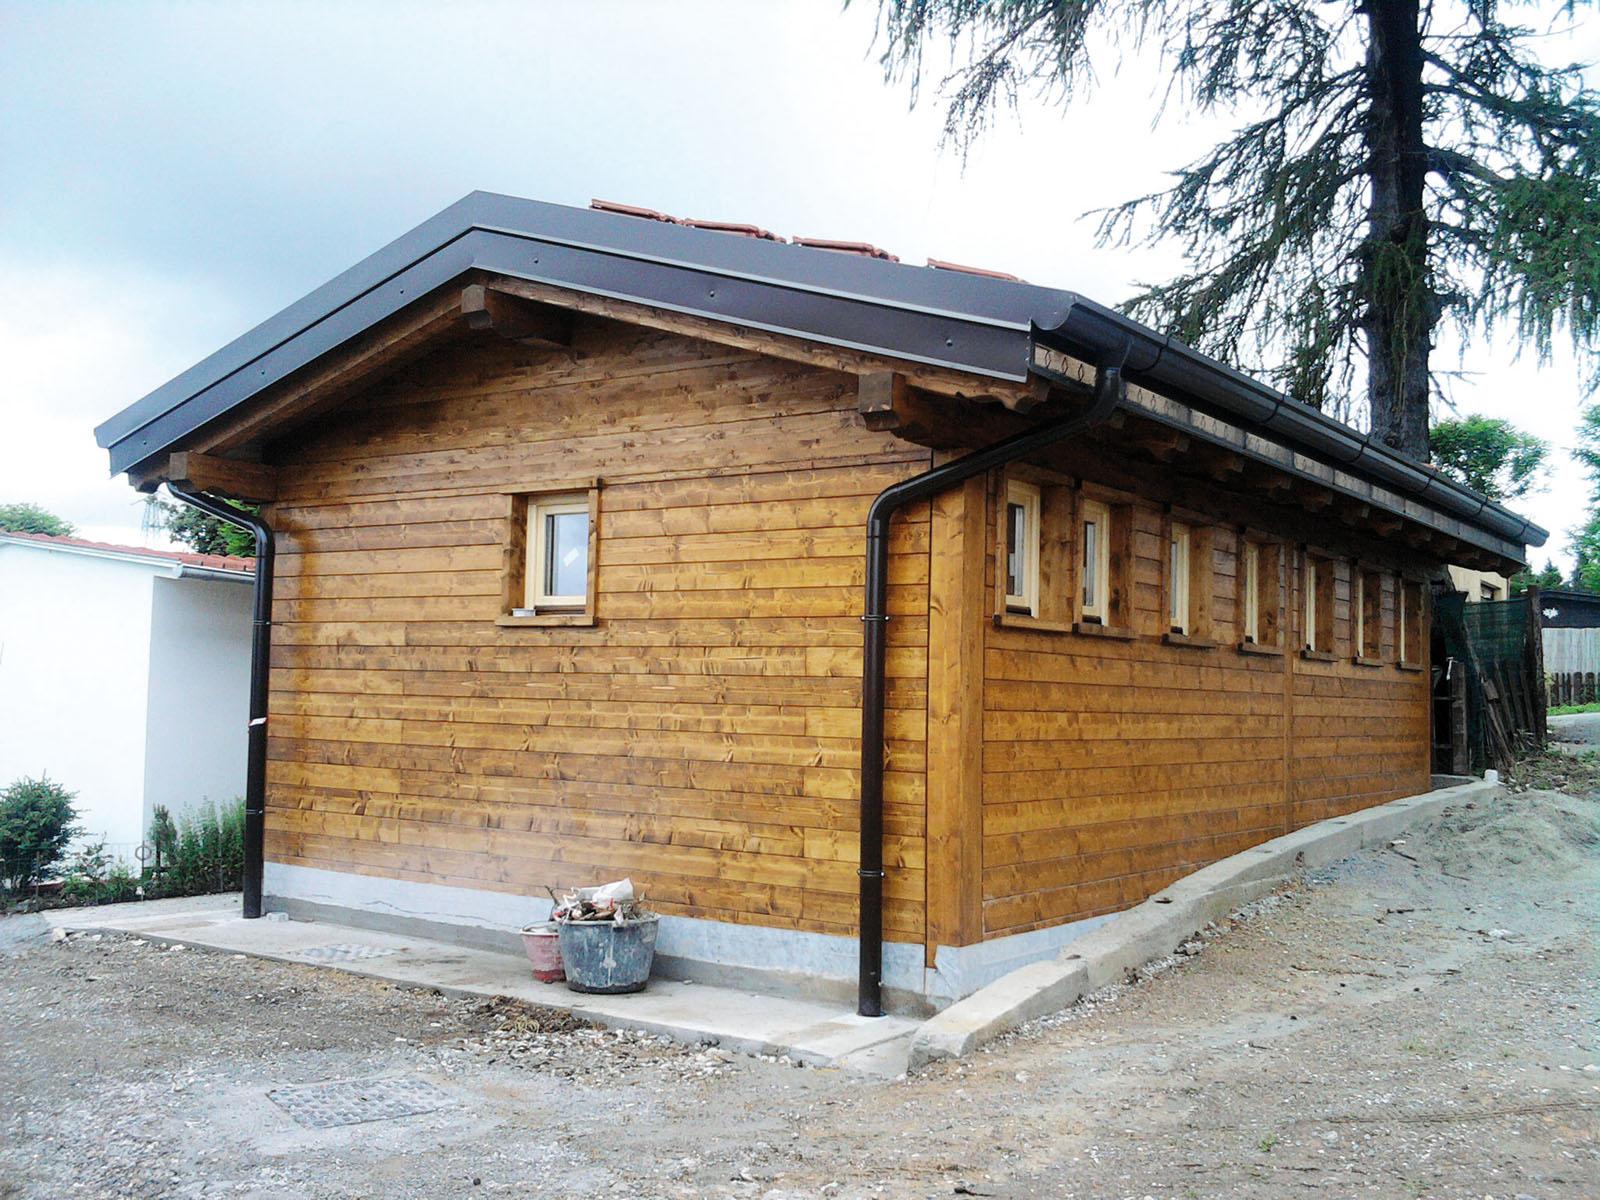 La casa prefabbricata a risparmio energetico c g tetti for Risparmio energetico casa